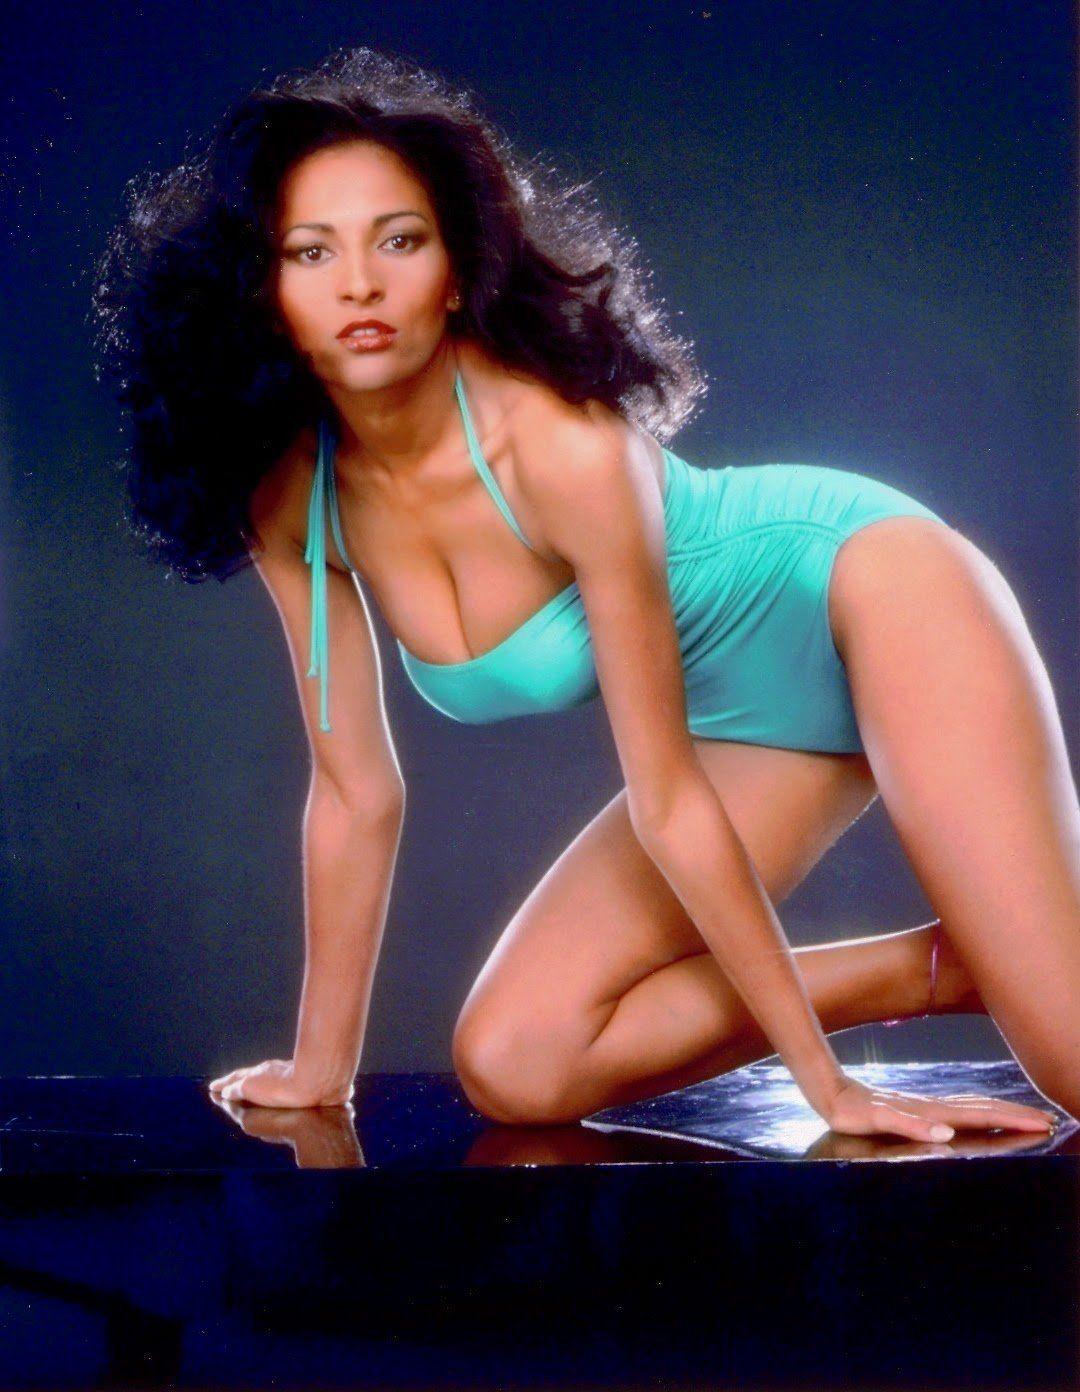 Hot black girls naked mirror pics